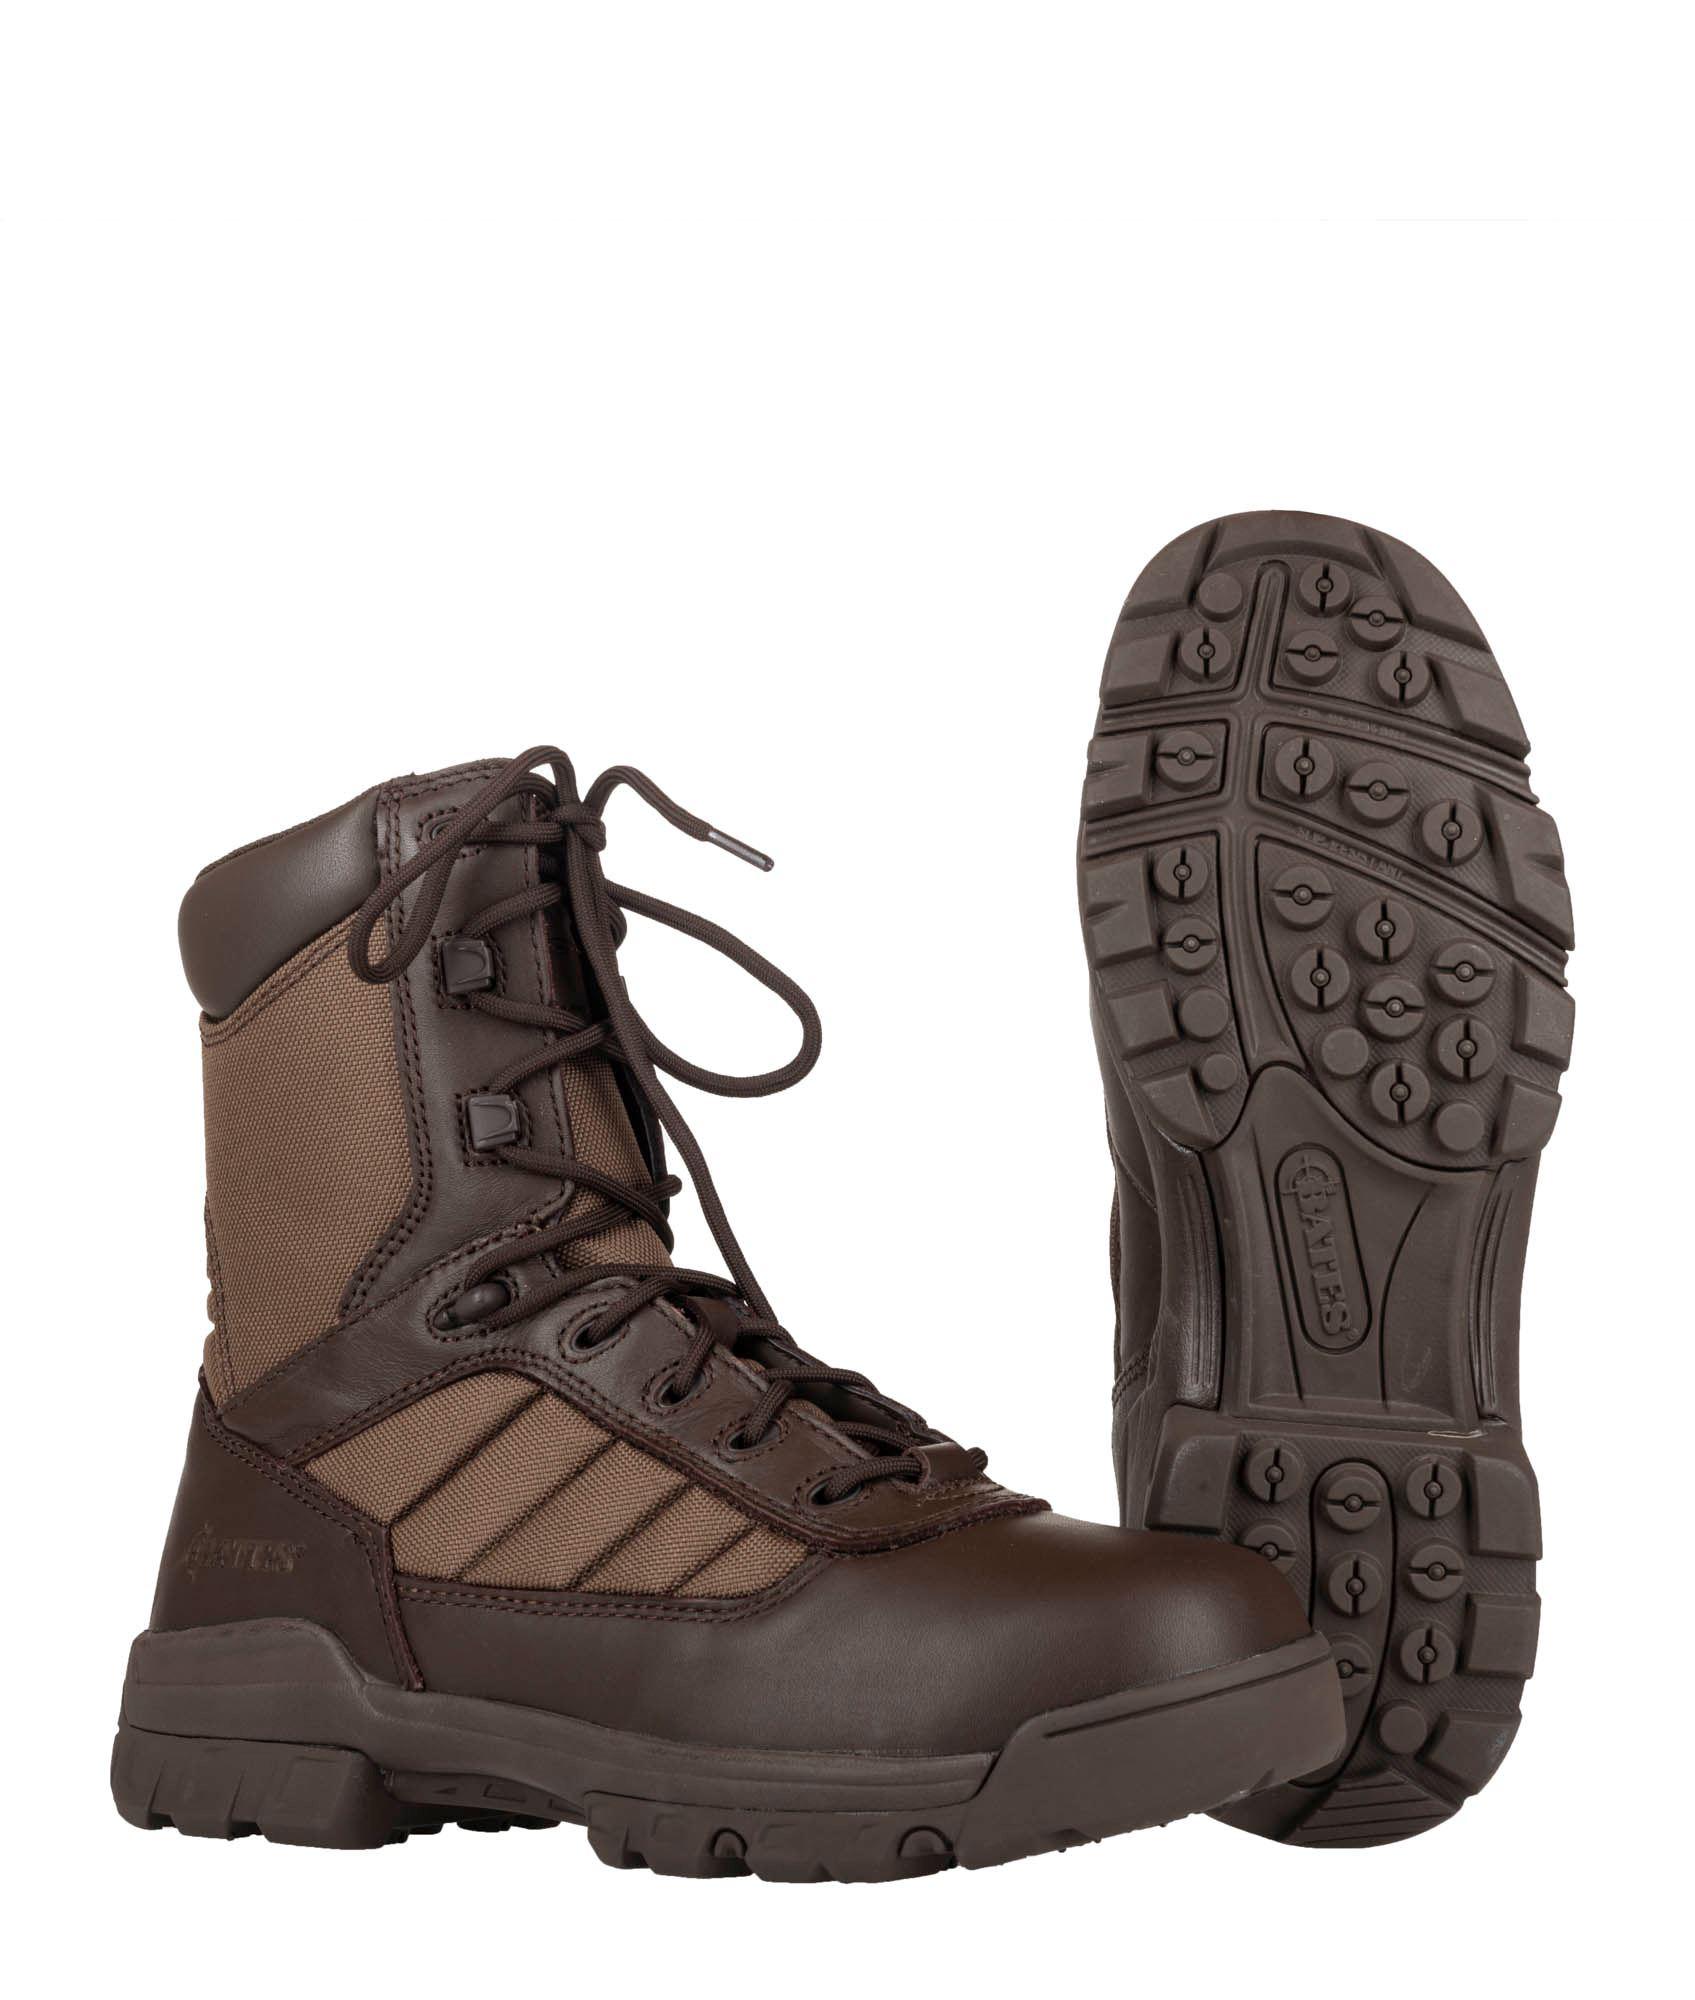 673f53f26ab Tactical Sport 8 støvler fra Bates. Prisgaranti hos 417.dk